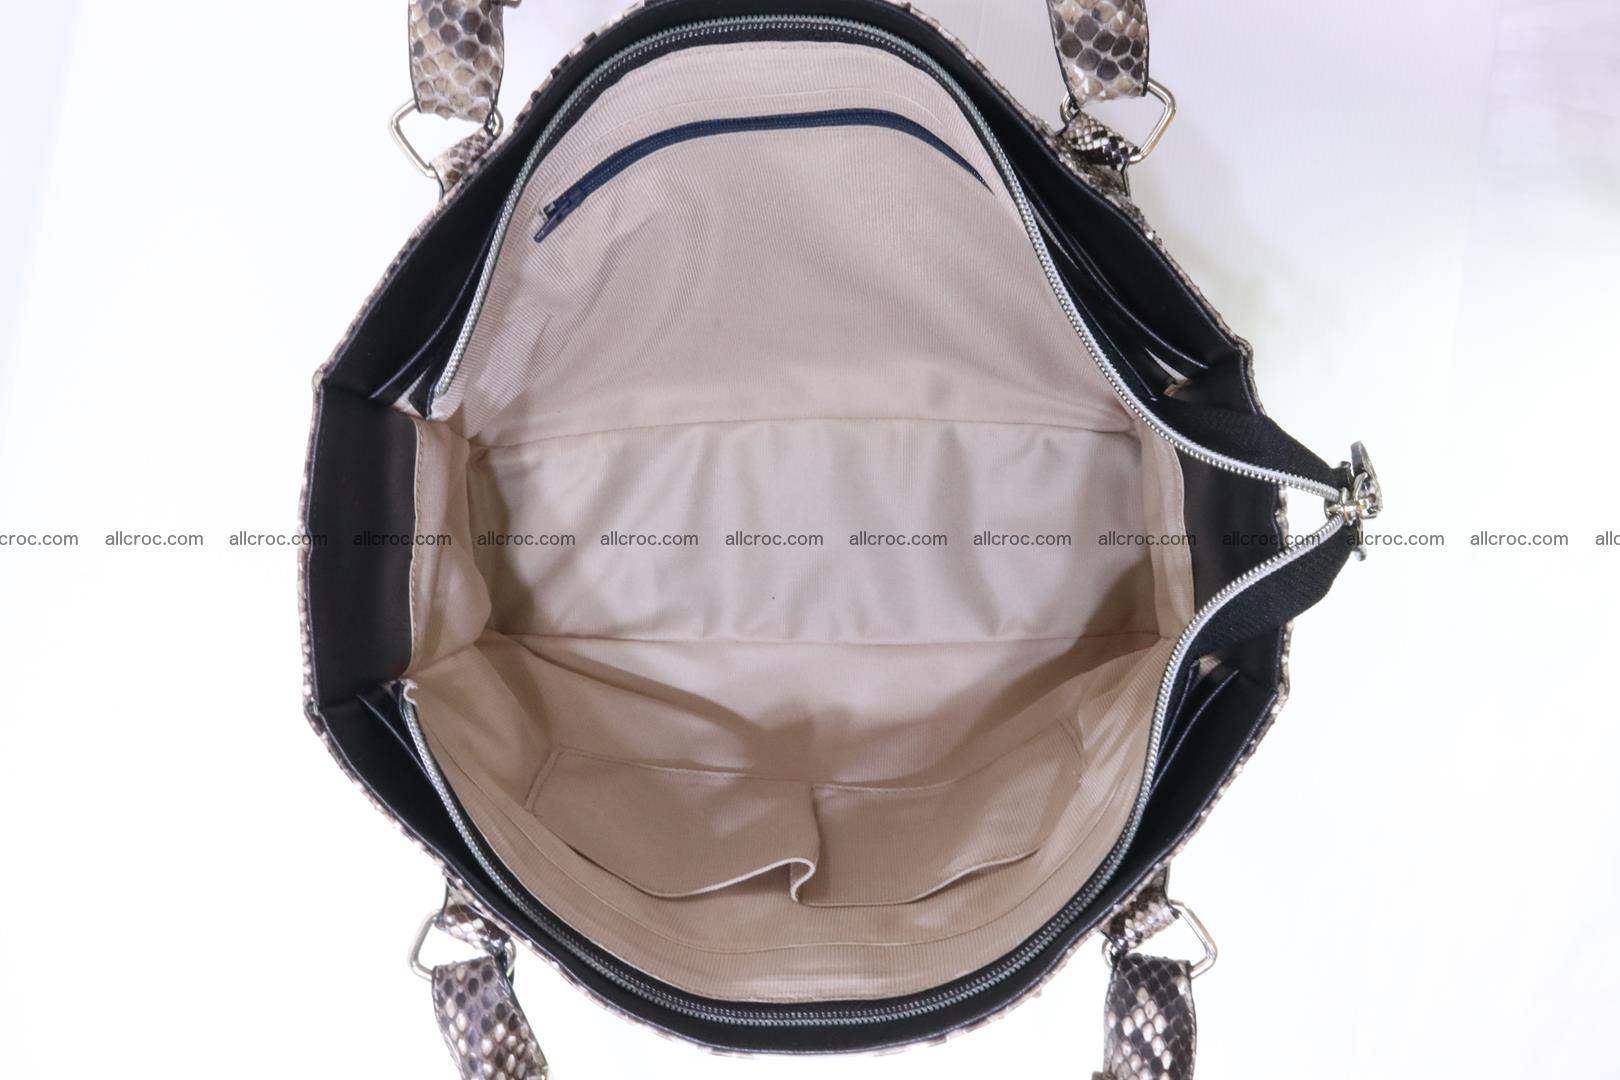 Python skin handbag for lady from genuine Python skin 206 Foto 10